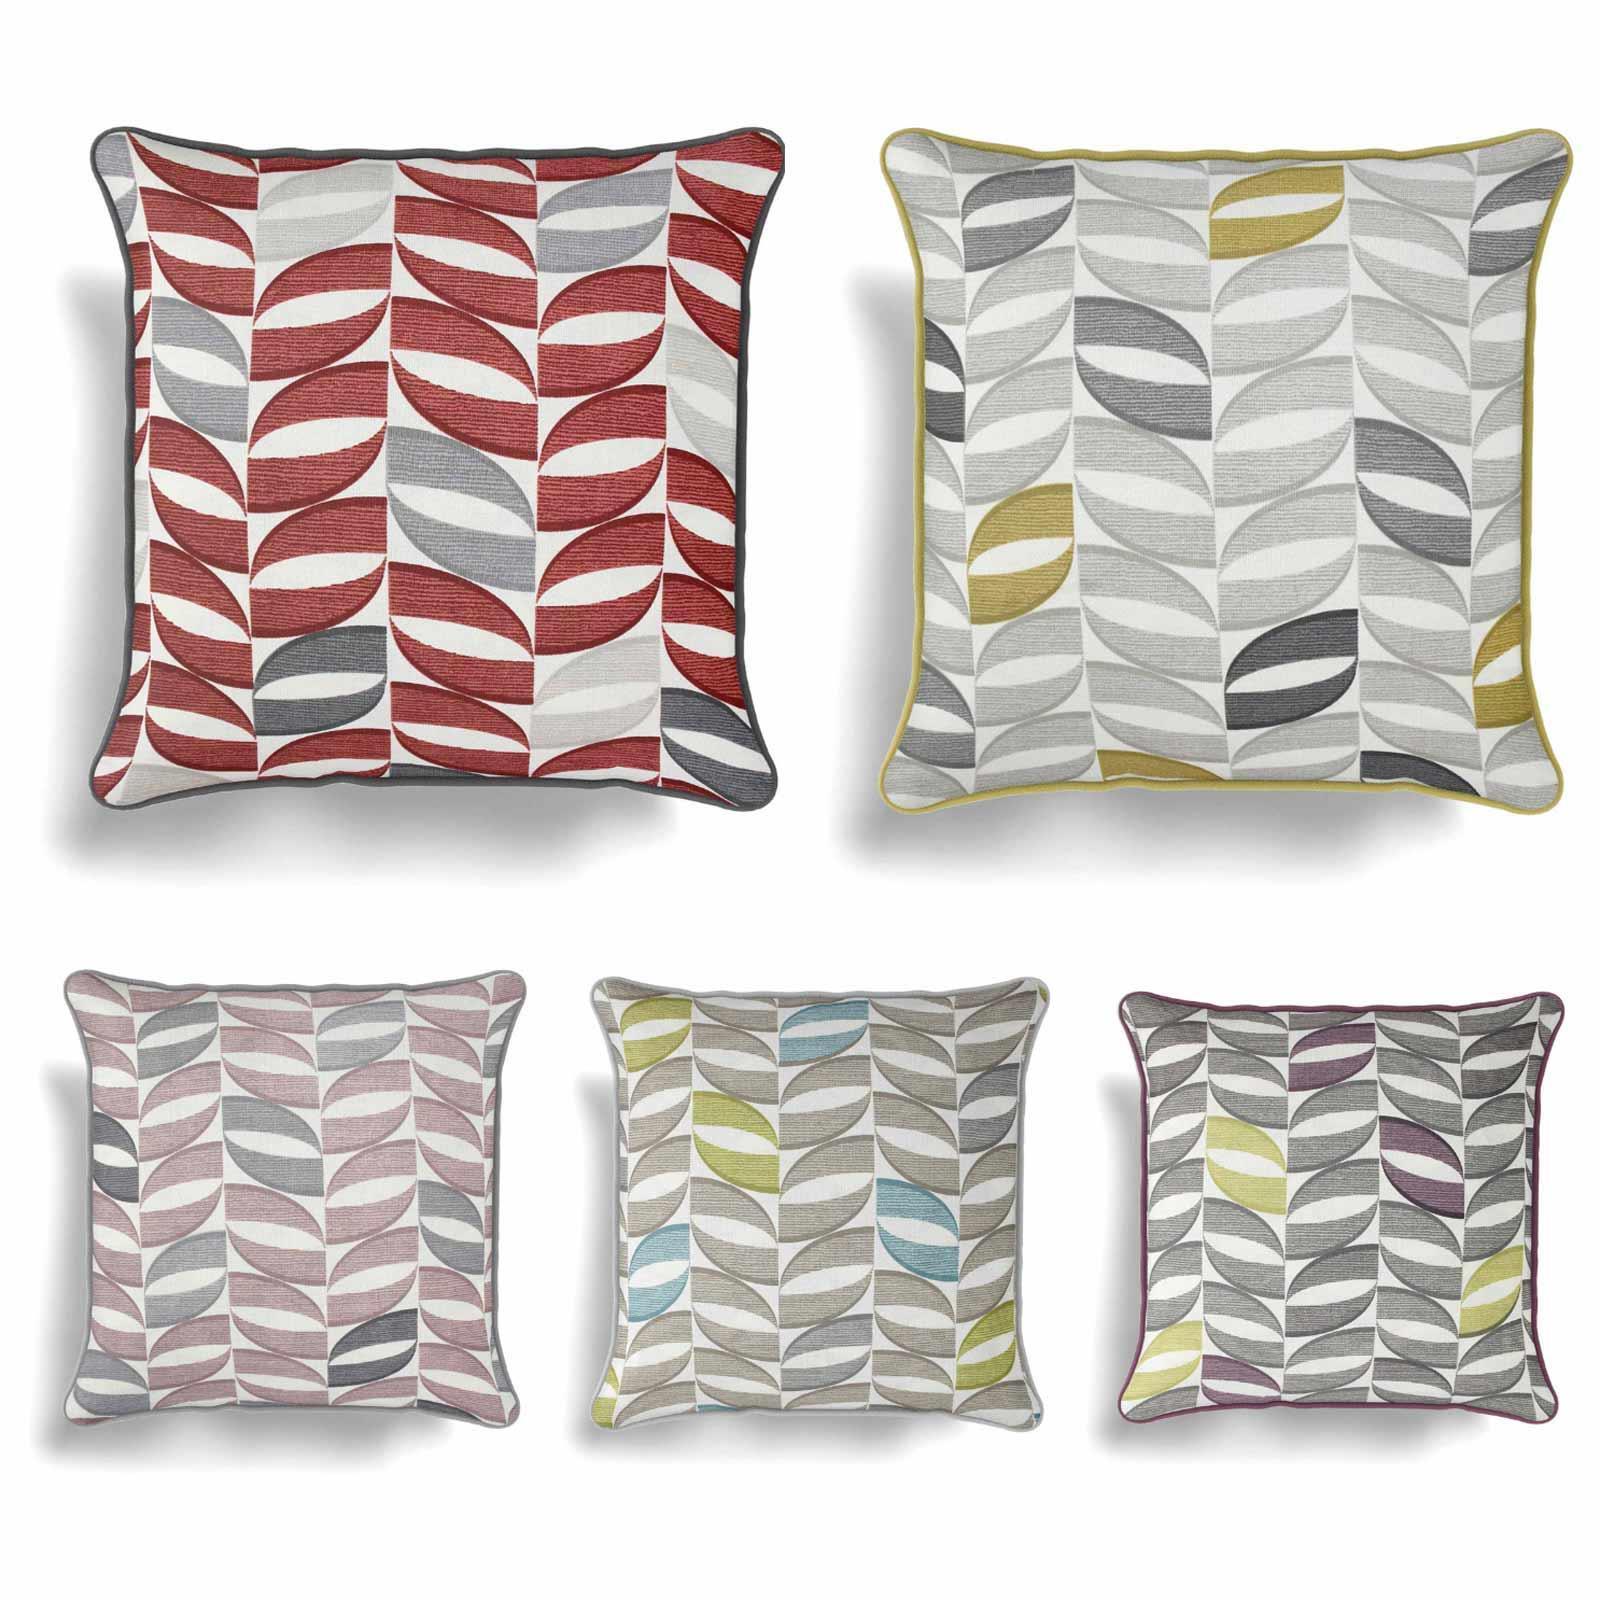 "Copeland Cushion Cover Modern Geometric Printed Cotton Covers 17/"" x 17/"""